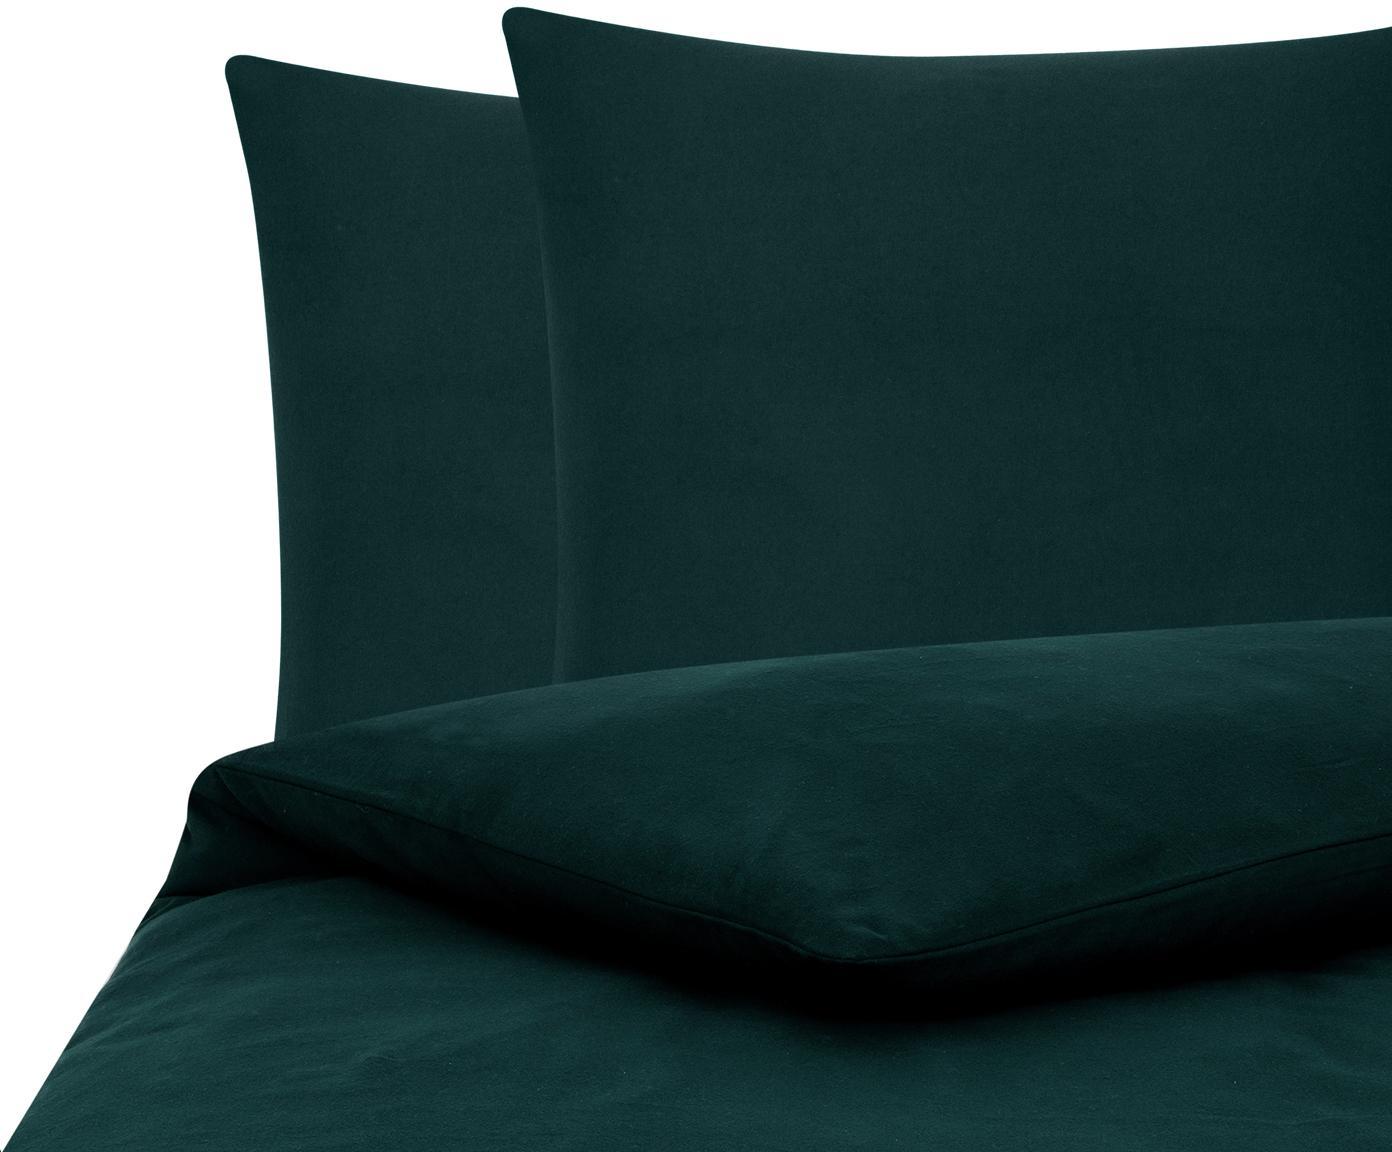 Flanell-Bettwäsche Biba in Waldgrün, Webart: Flanell Flanell ist ein s, Waldgrün, 200 x 200 cm + 2 Kissen 80 x 80 cm